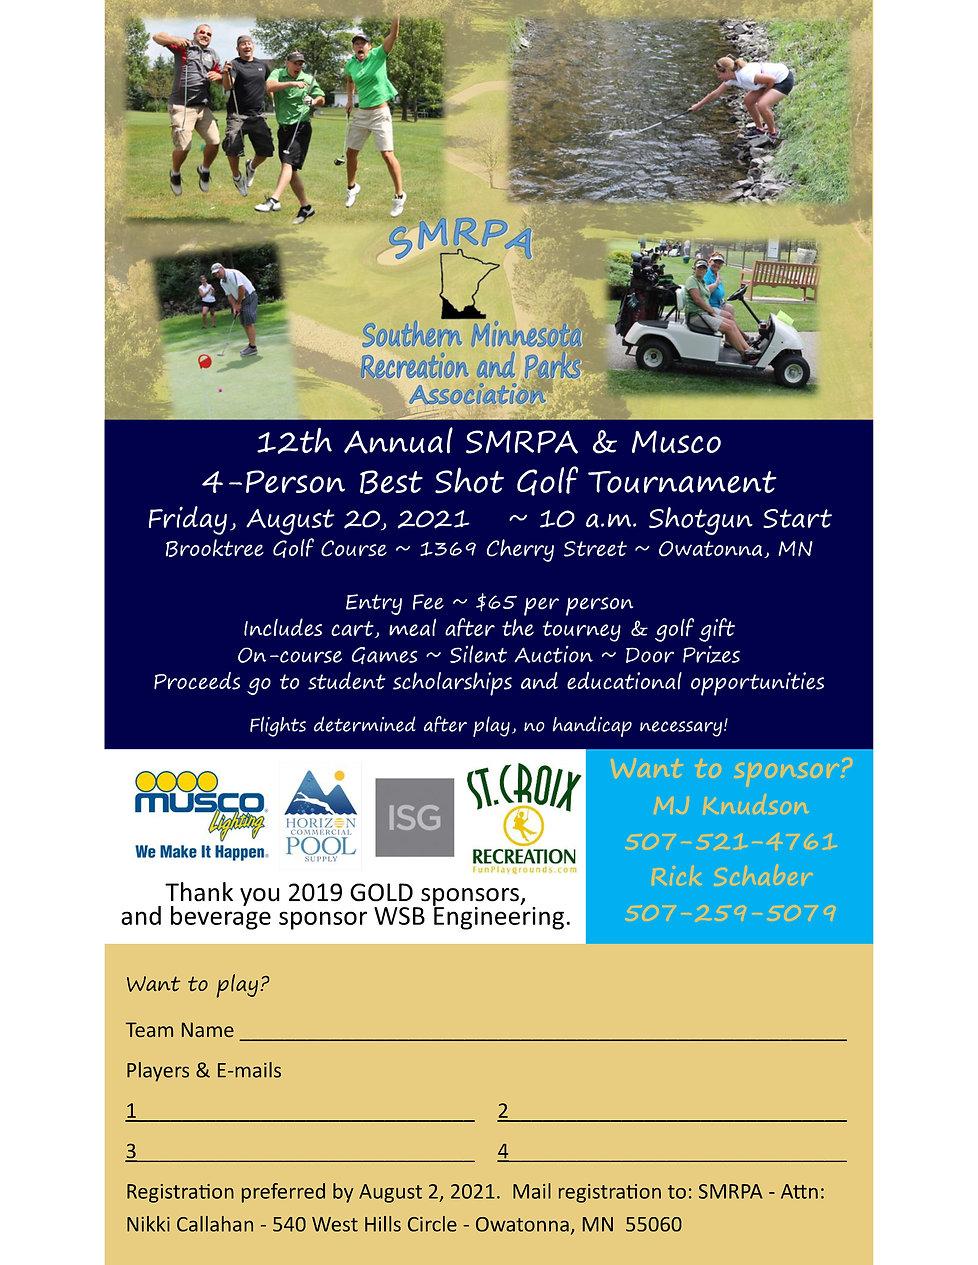 SMRPA Golf Flyer 2021.jpg